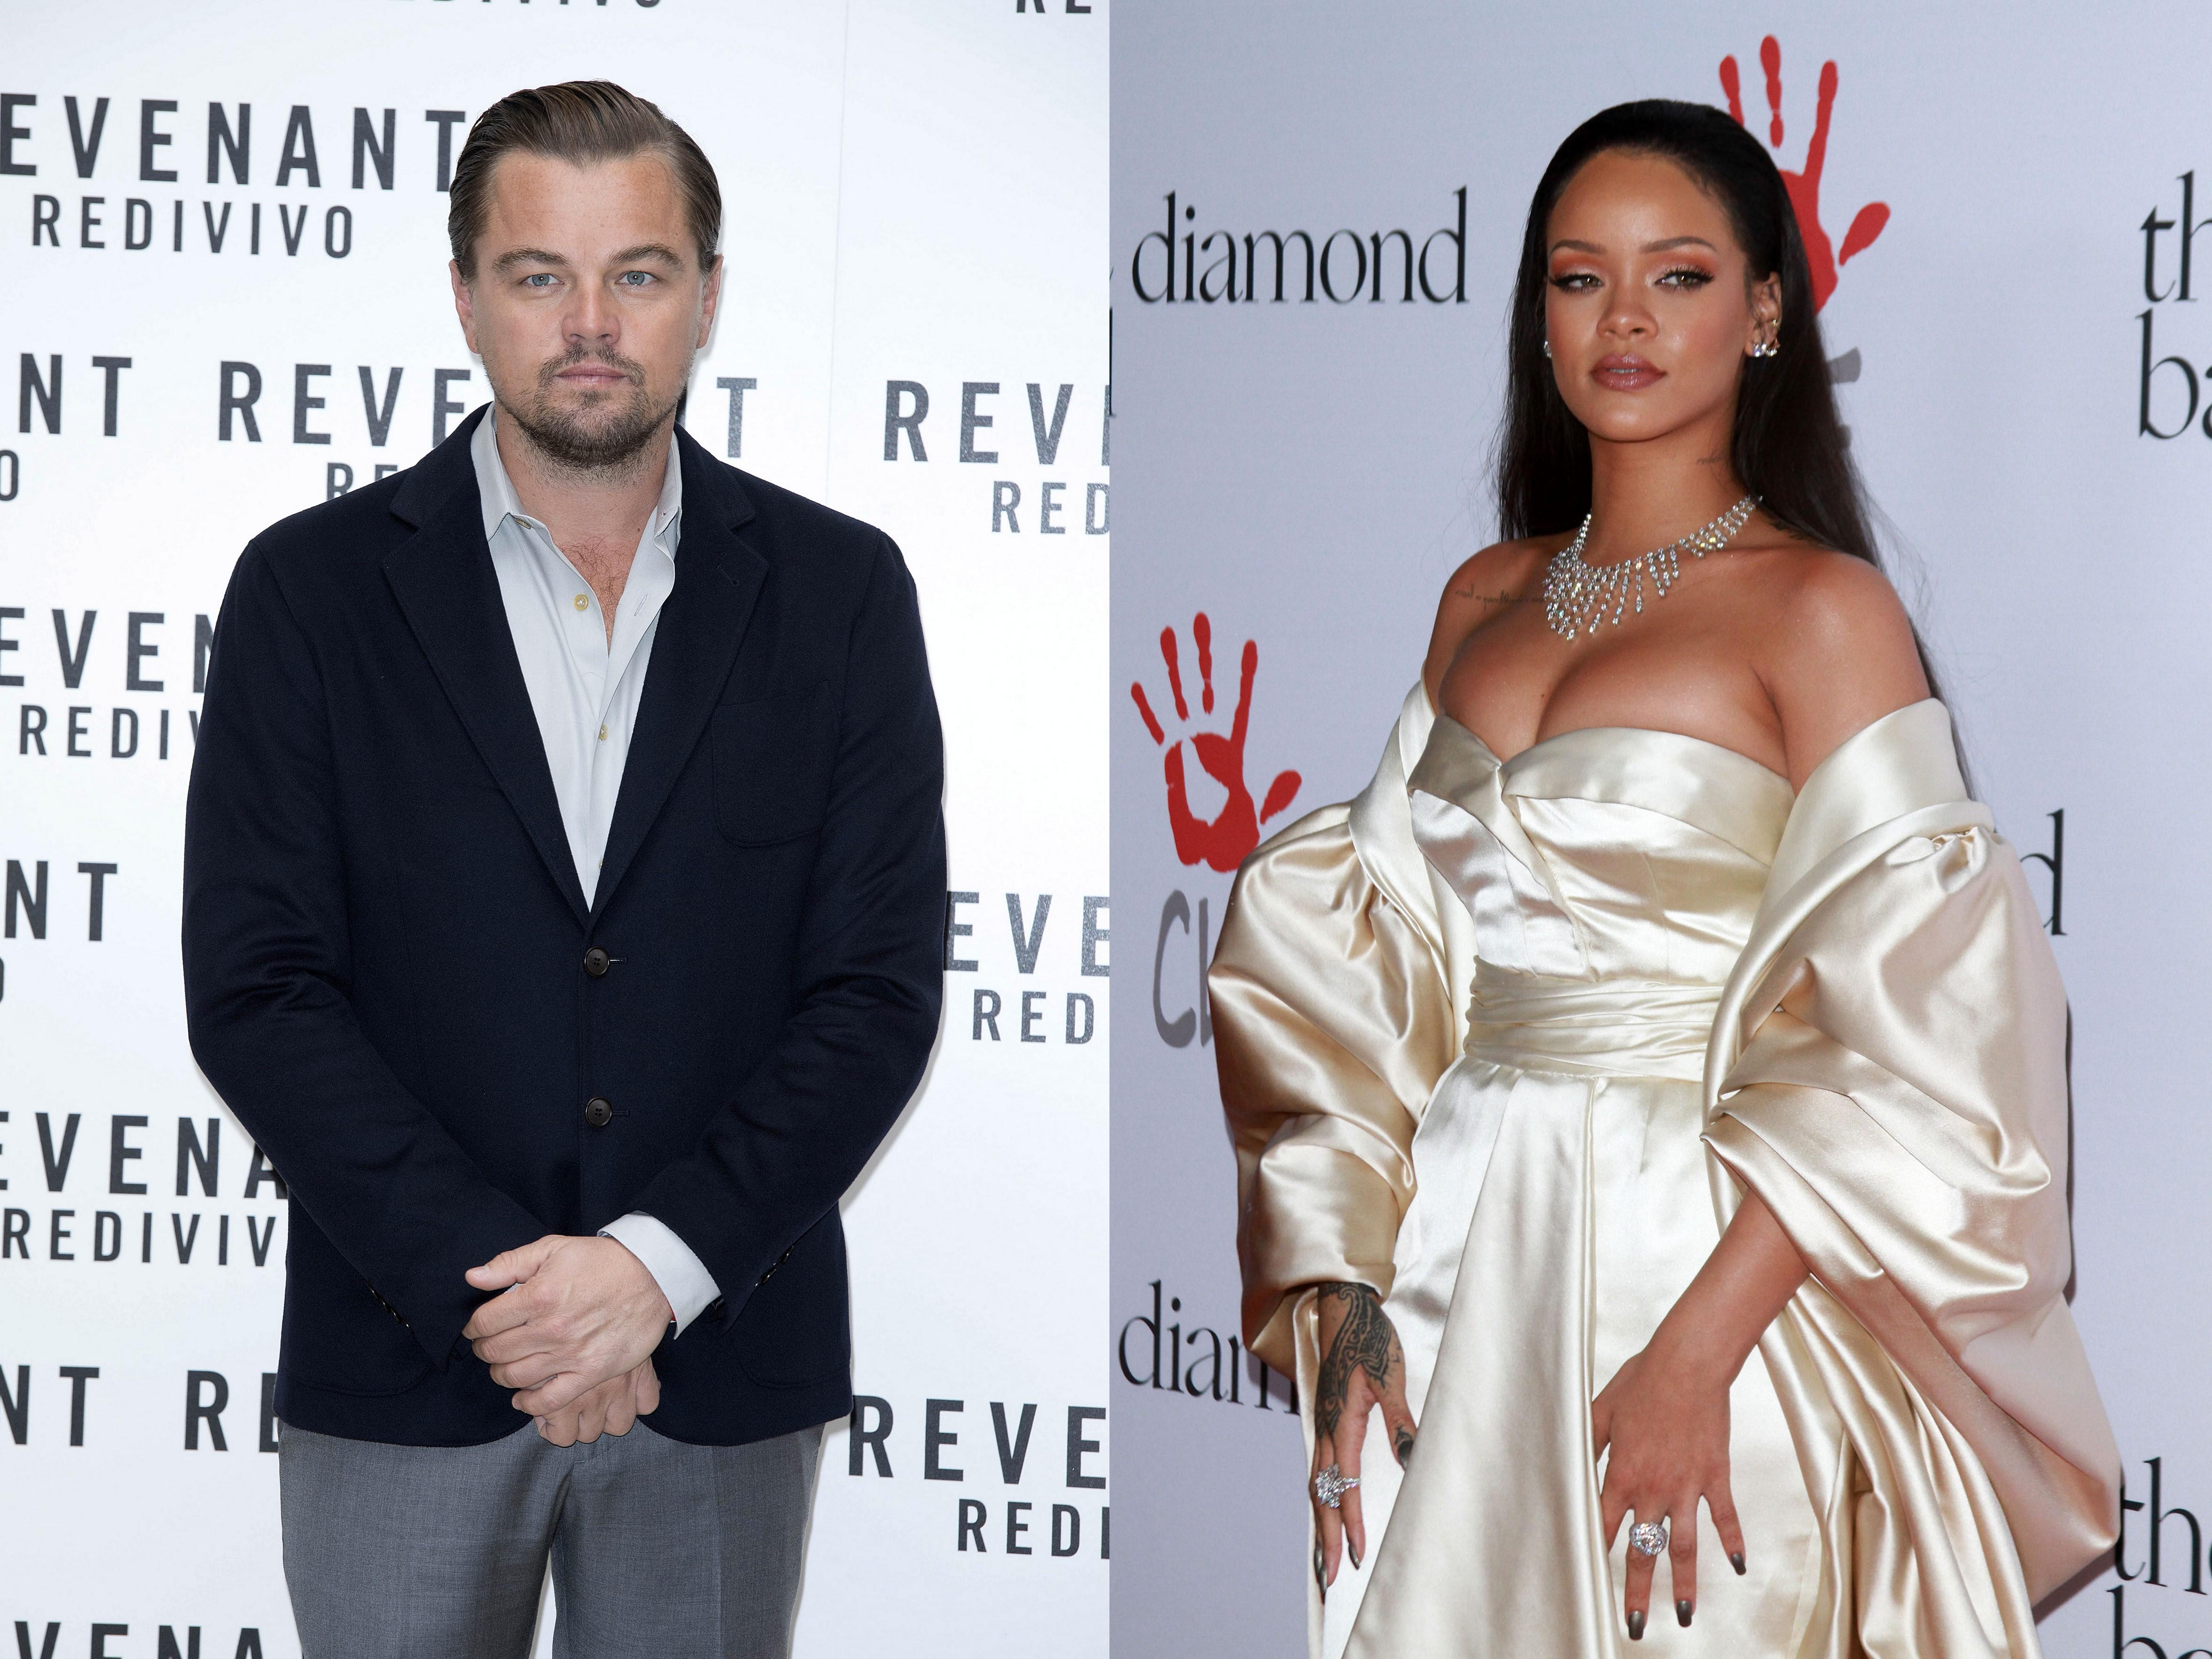 Leonardo DiCaprio parties with Rihanna at Coachella